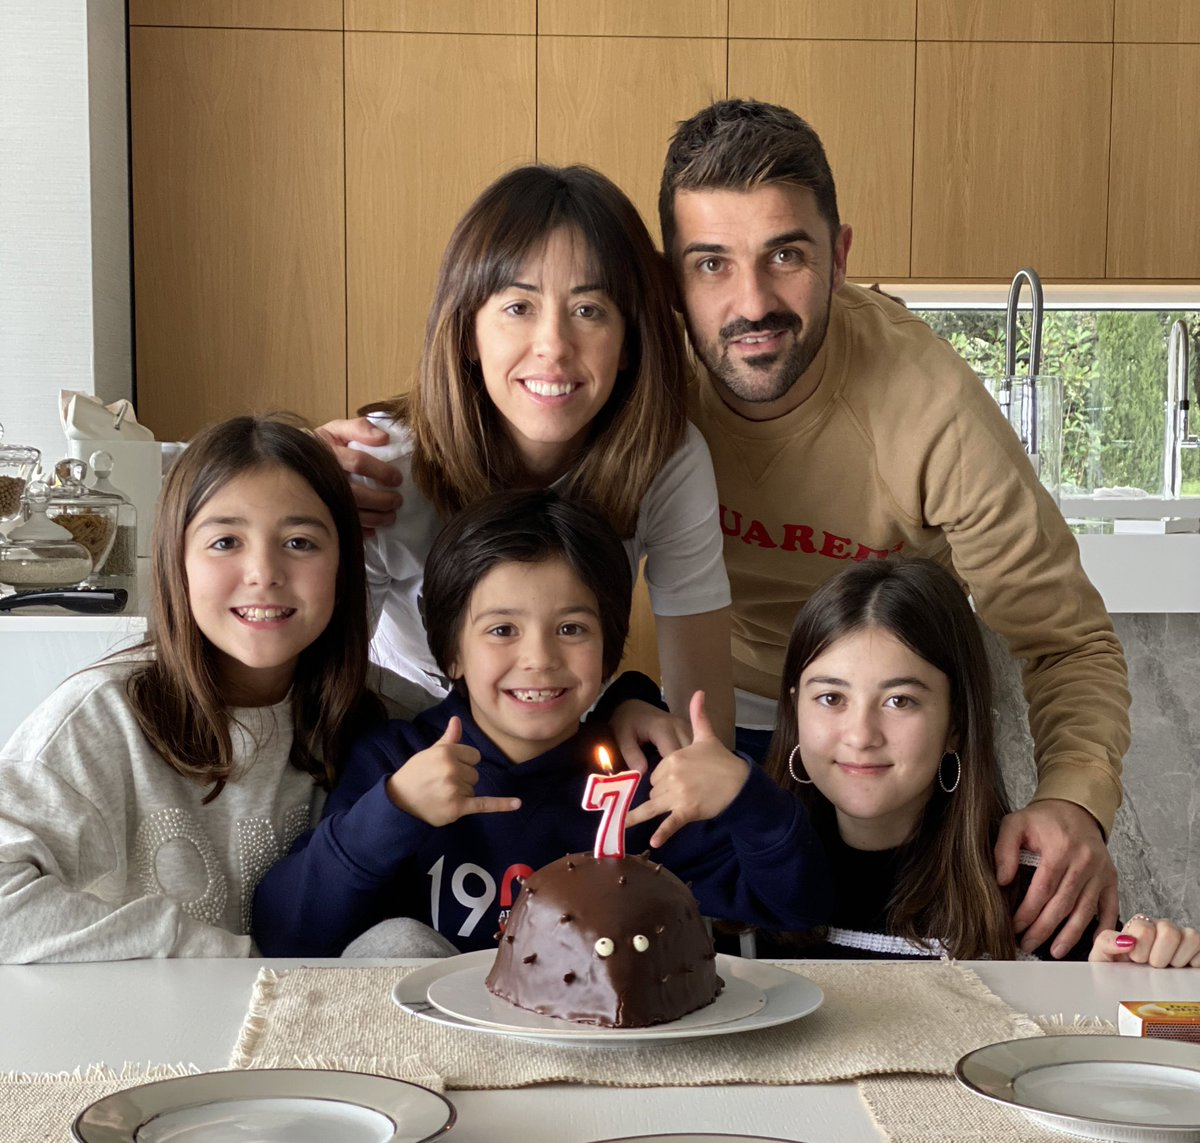 Feliz cumpleaños guaperas ❤️7️⃣ 🎂 #luca #7años #familygoals